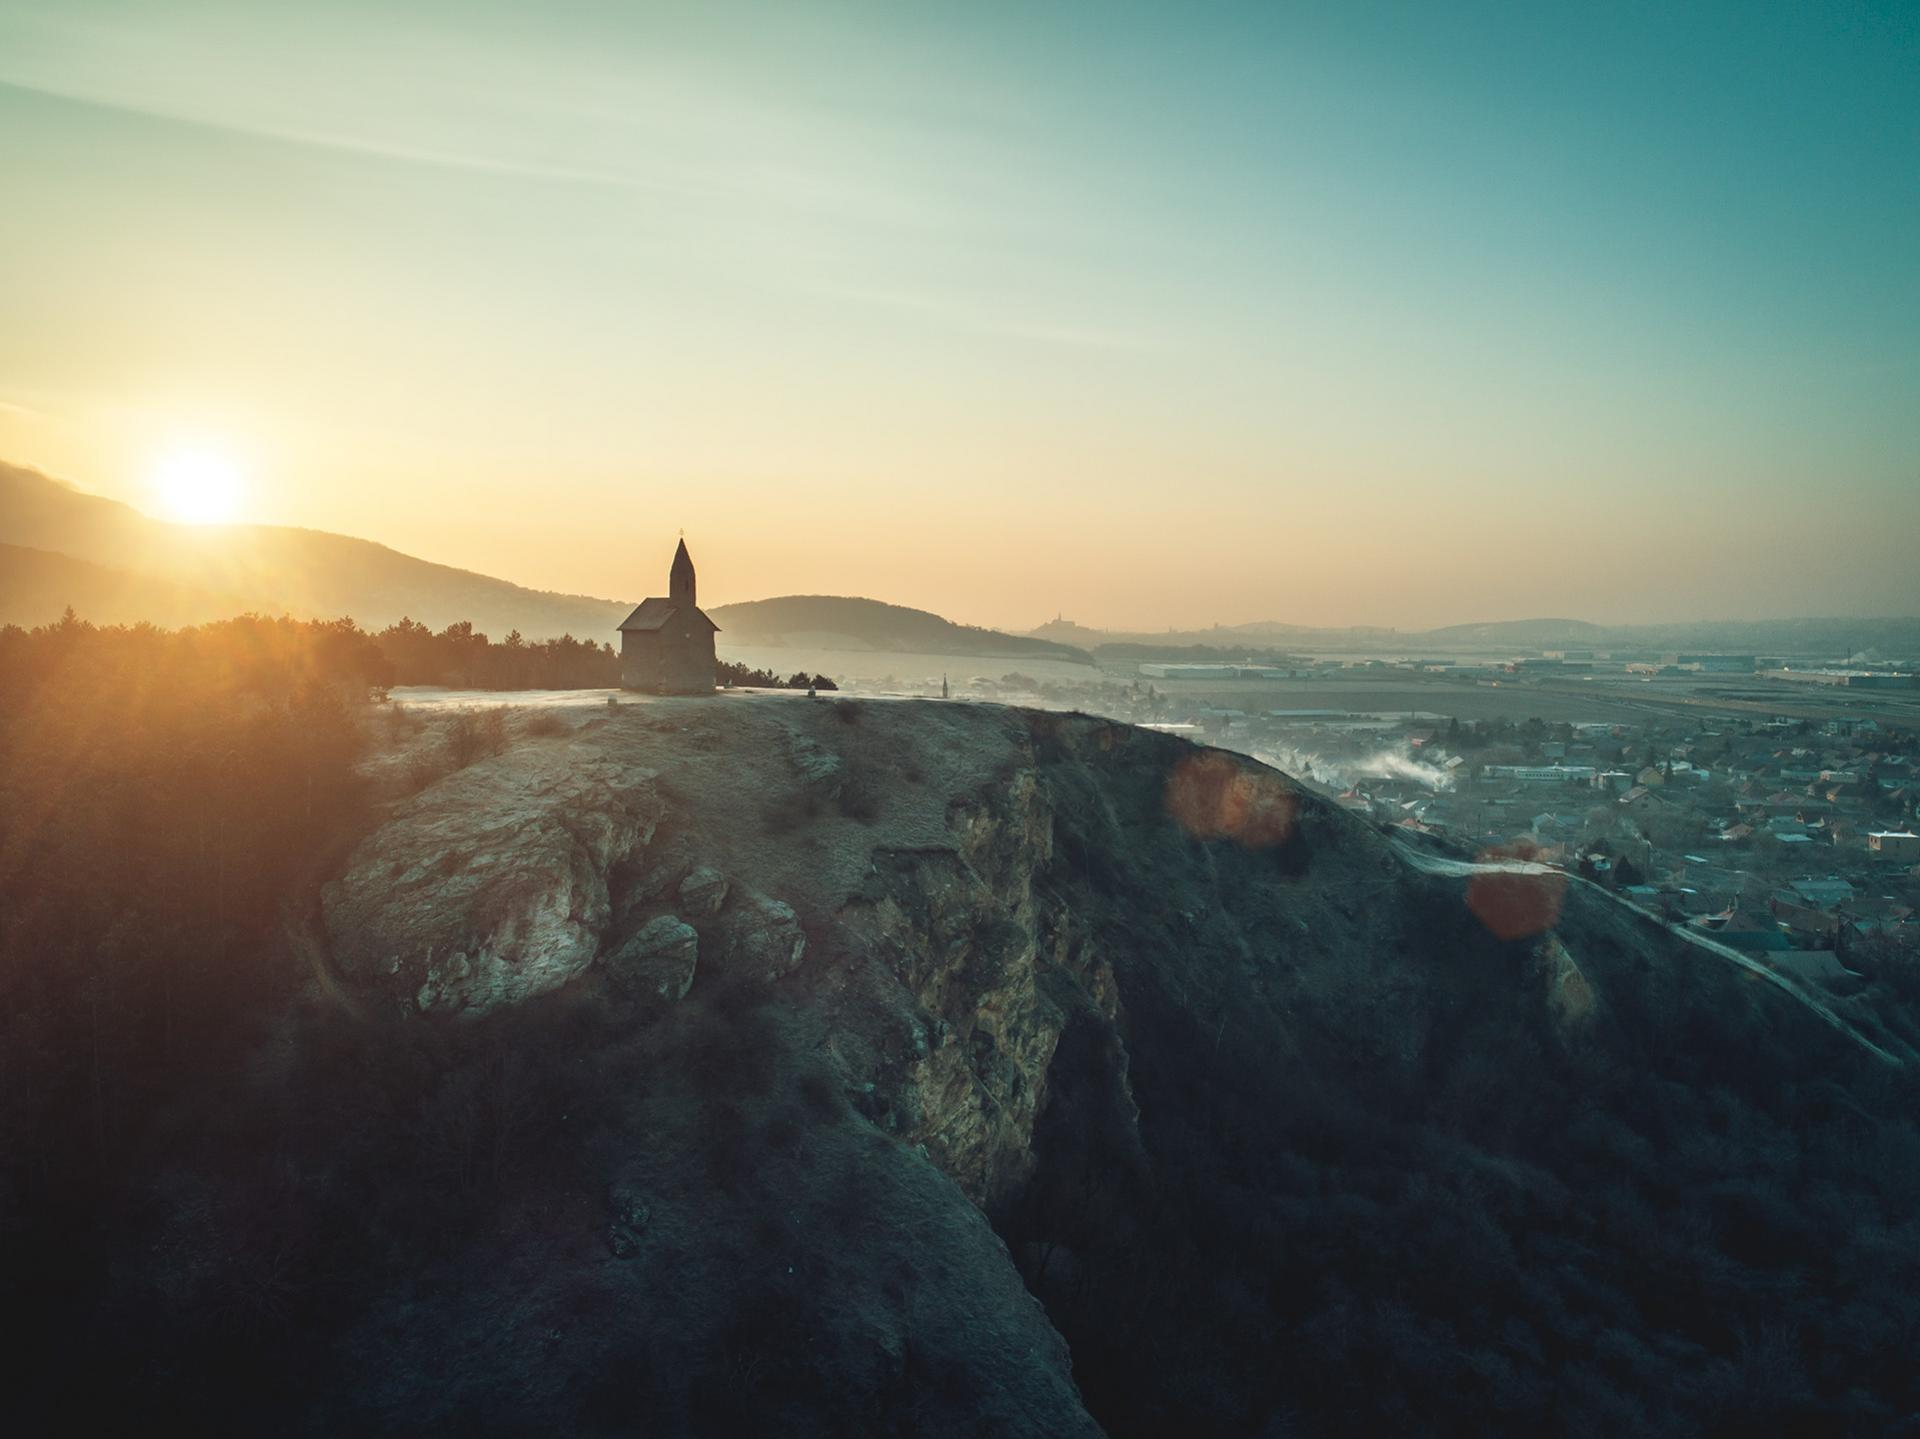 Luca Bush - nitra medzi nebom a zemou